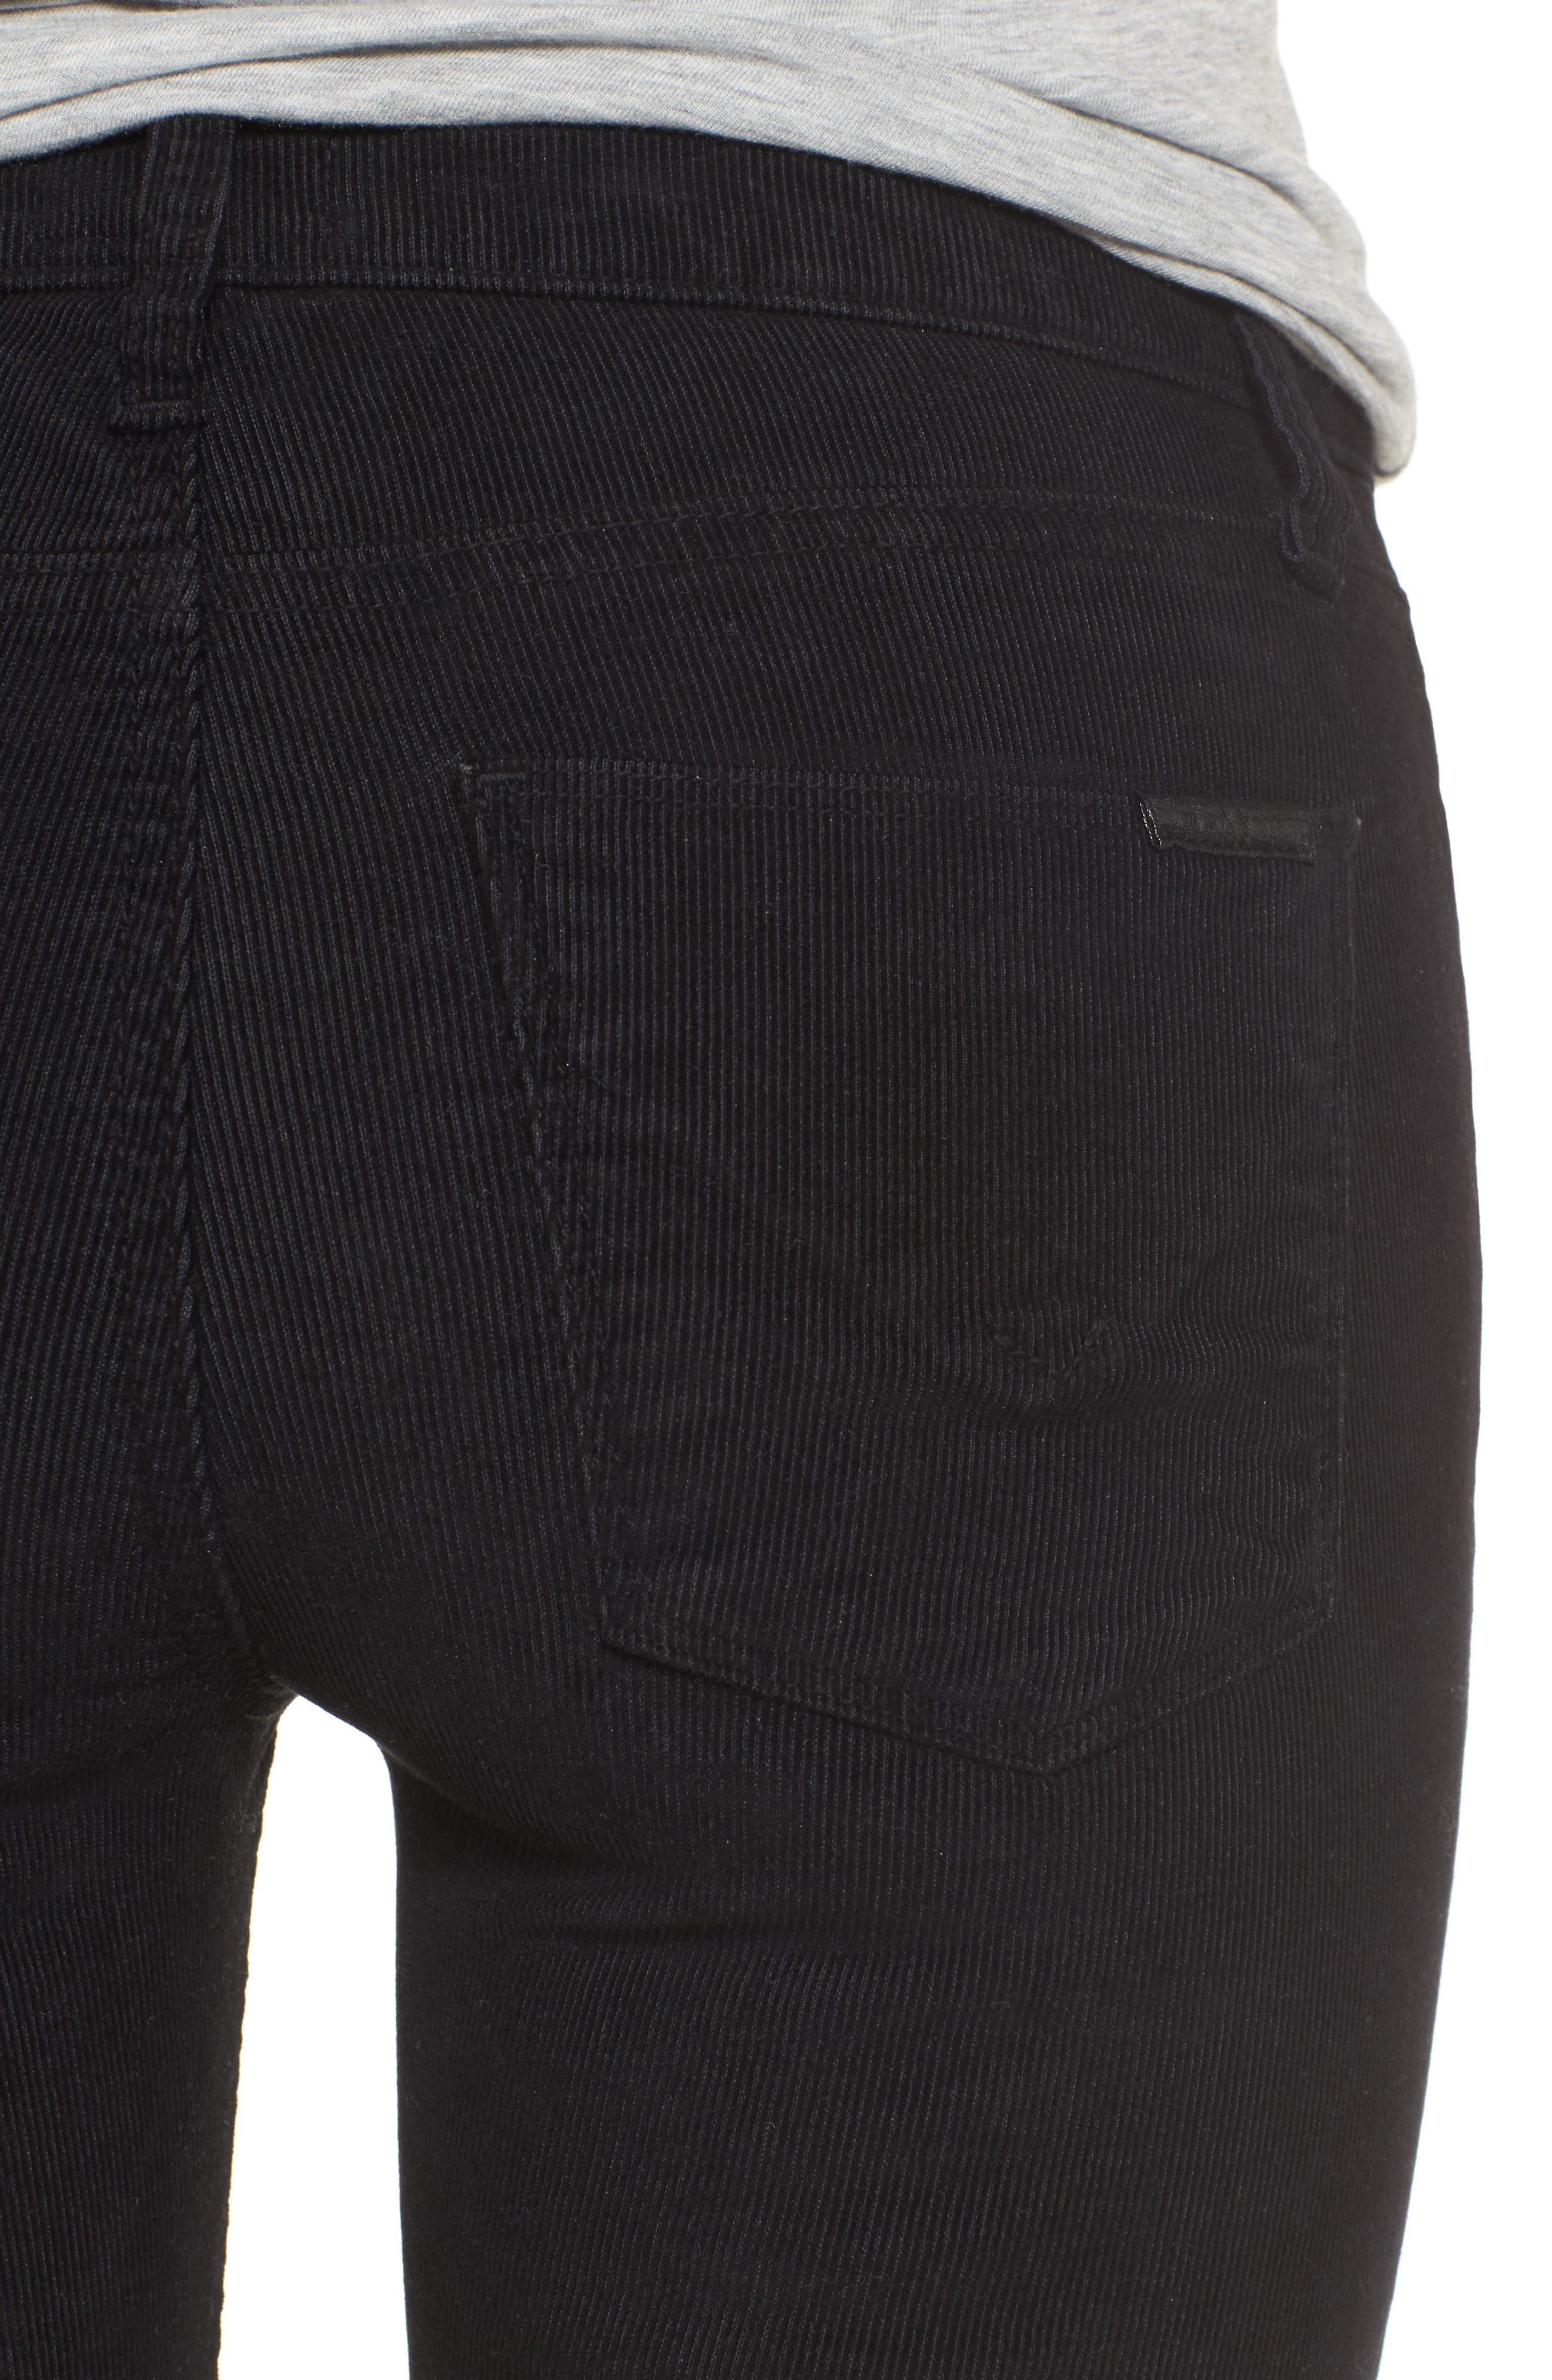 Nico Ankle Super Skinny Corduroy Pants,                             Alternate thumbnail 4, color,                             001